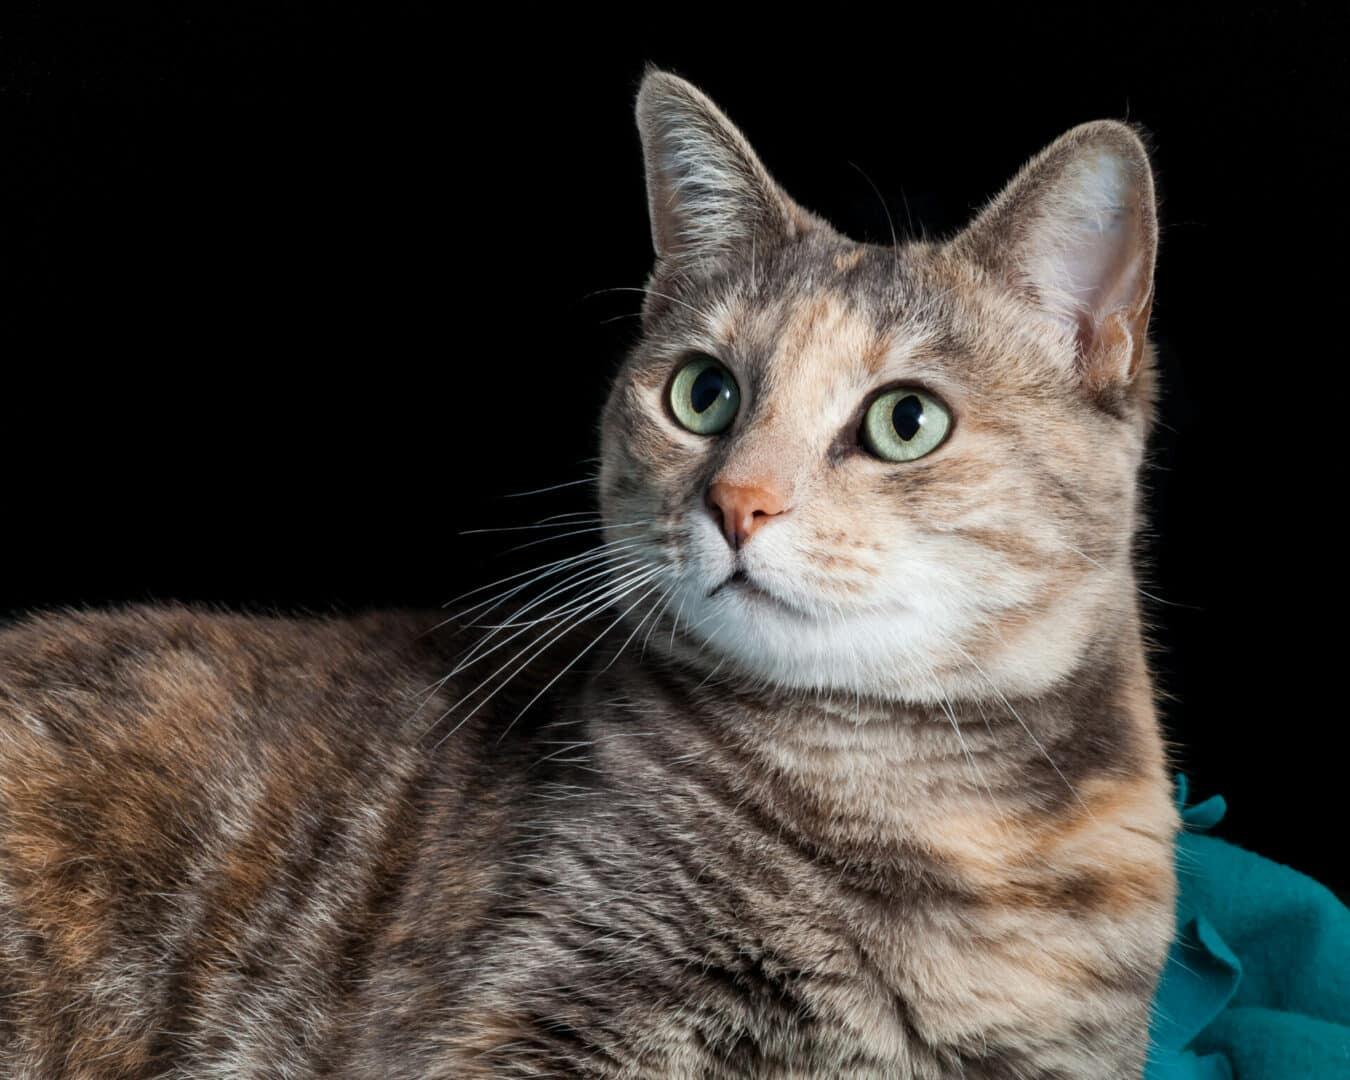 types of tabby cat markings